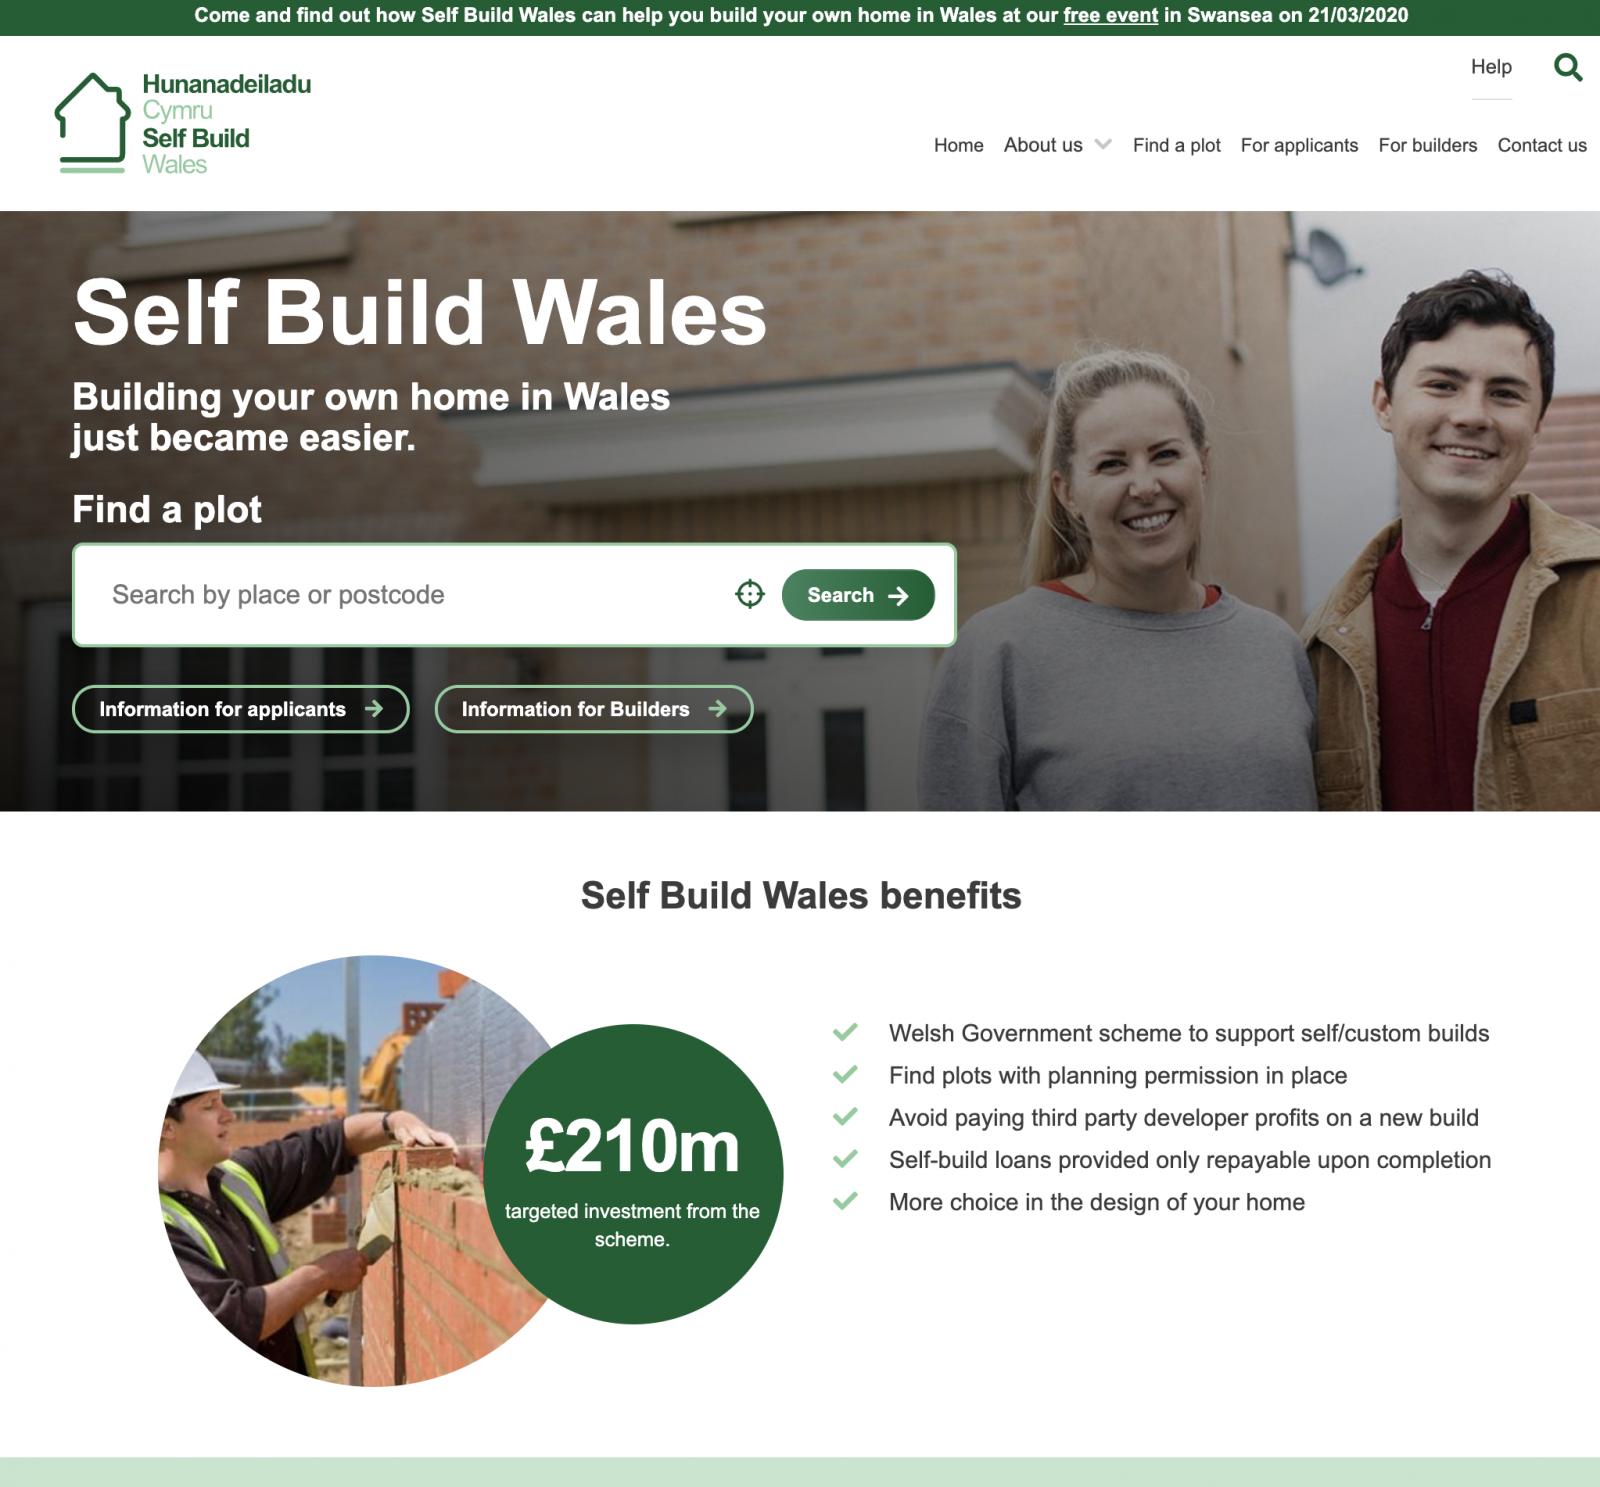 Self Build Wales